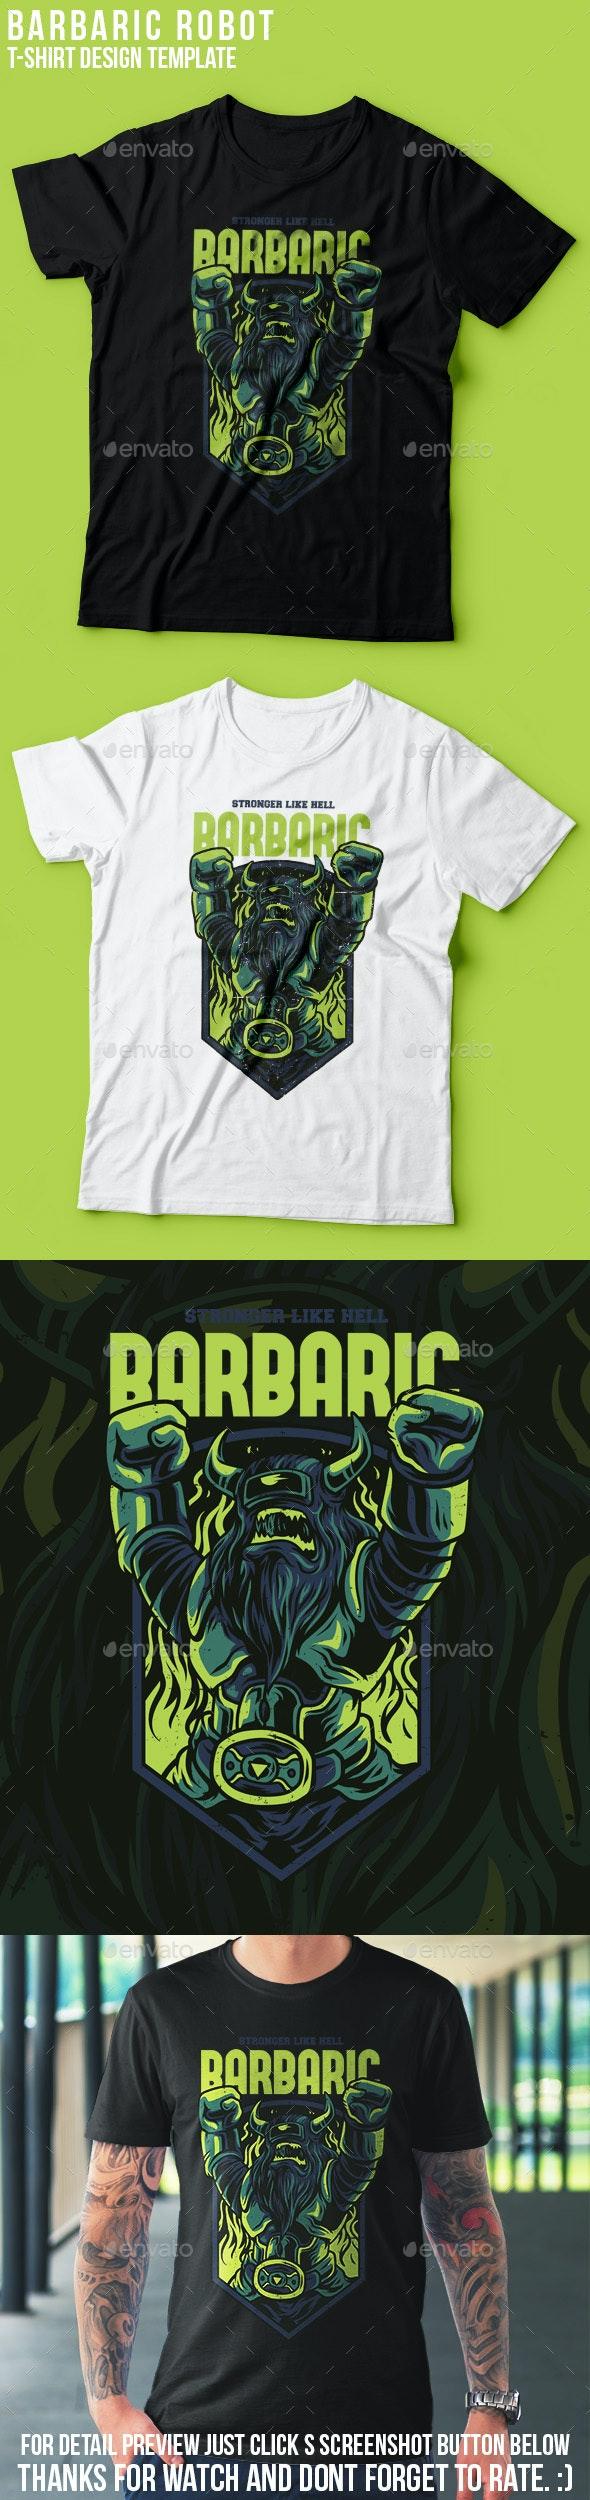 Barbaric Robot T-Shirt Design - Events T-Shirts